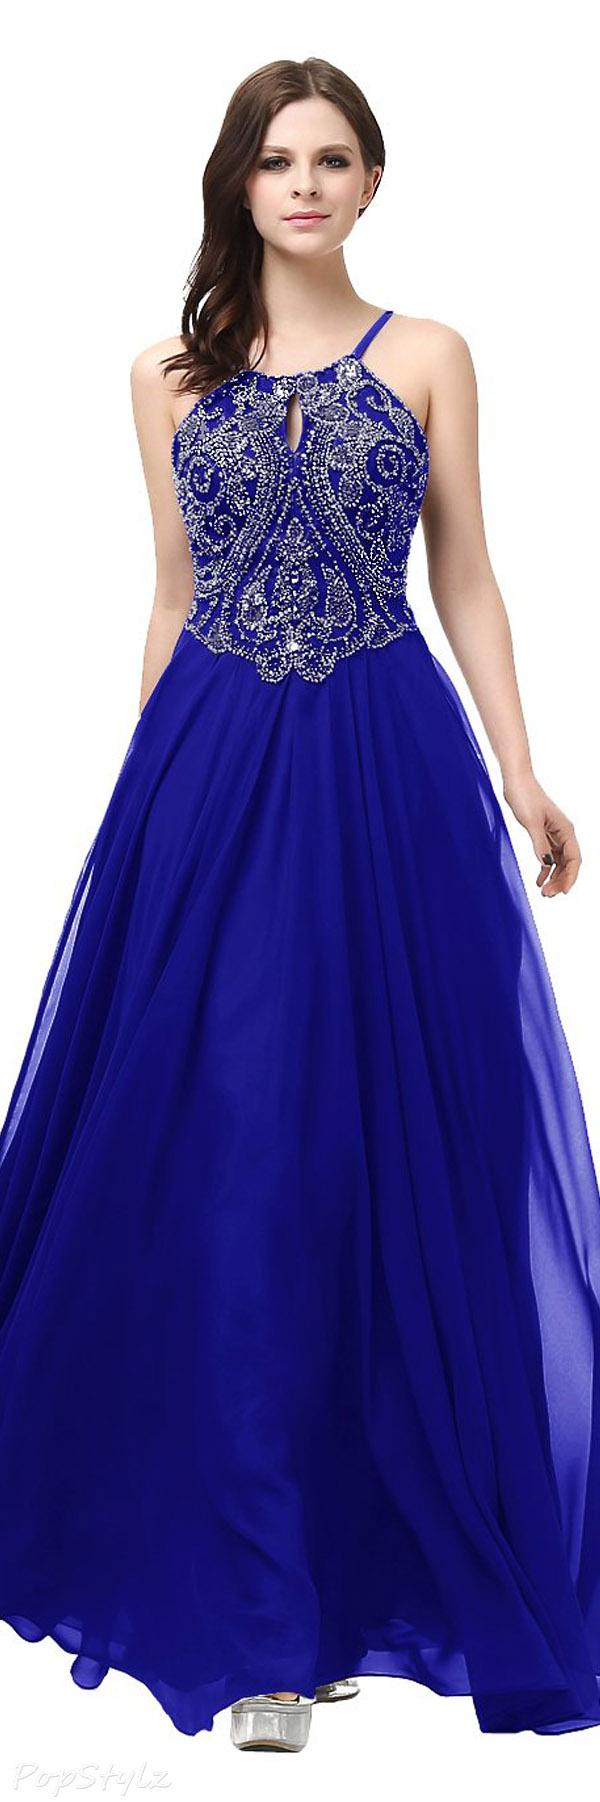 Diyouth Elegant Beaded Halter Evening Gown